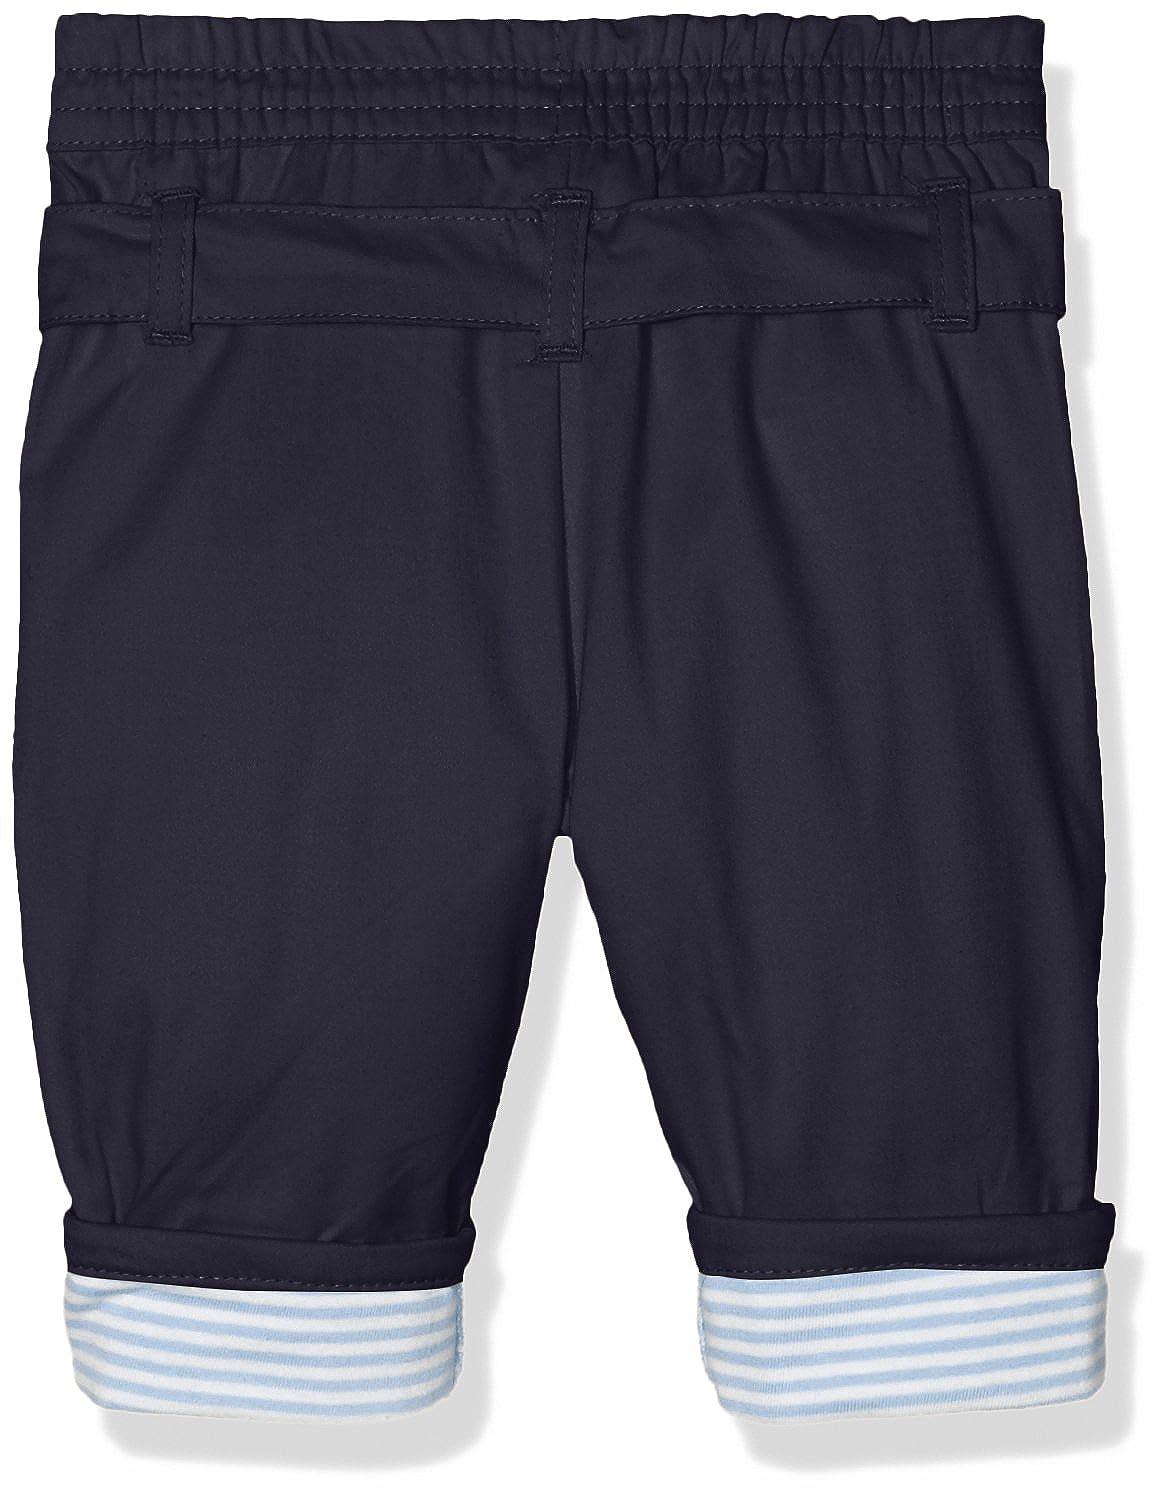 Pantalones Beb/é unisex Twins 1 250 25